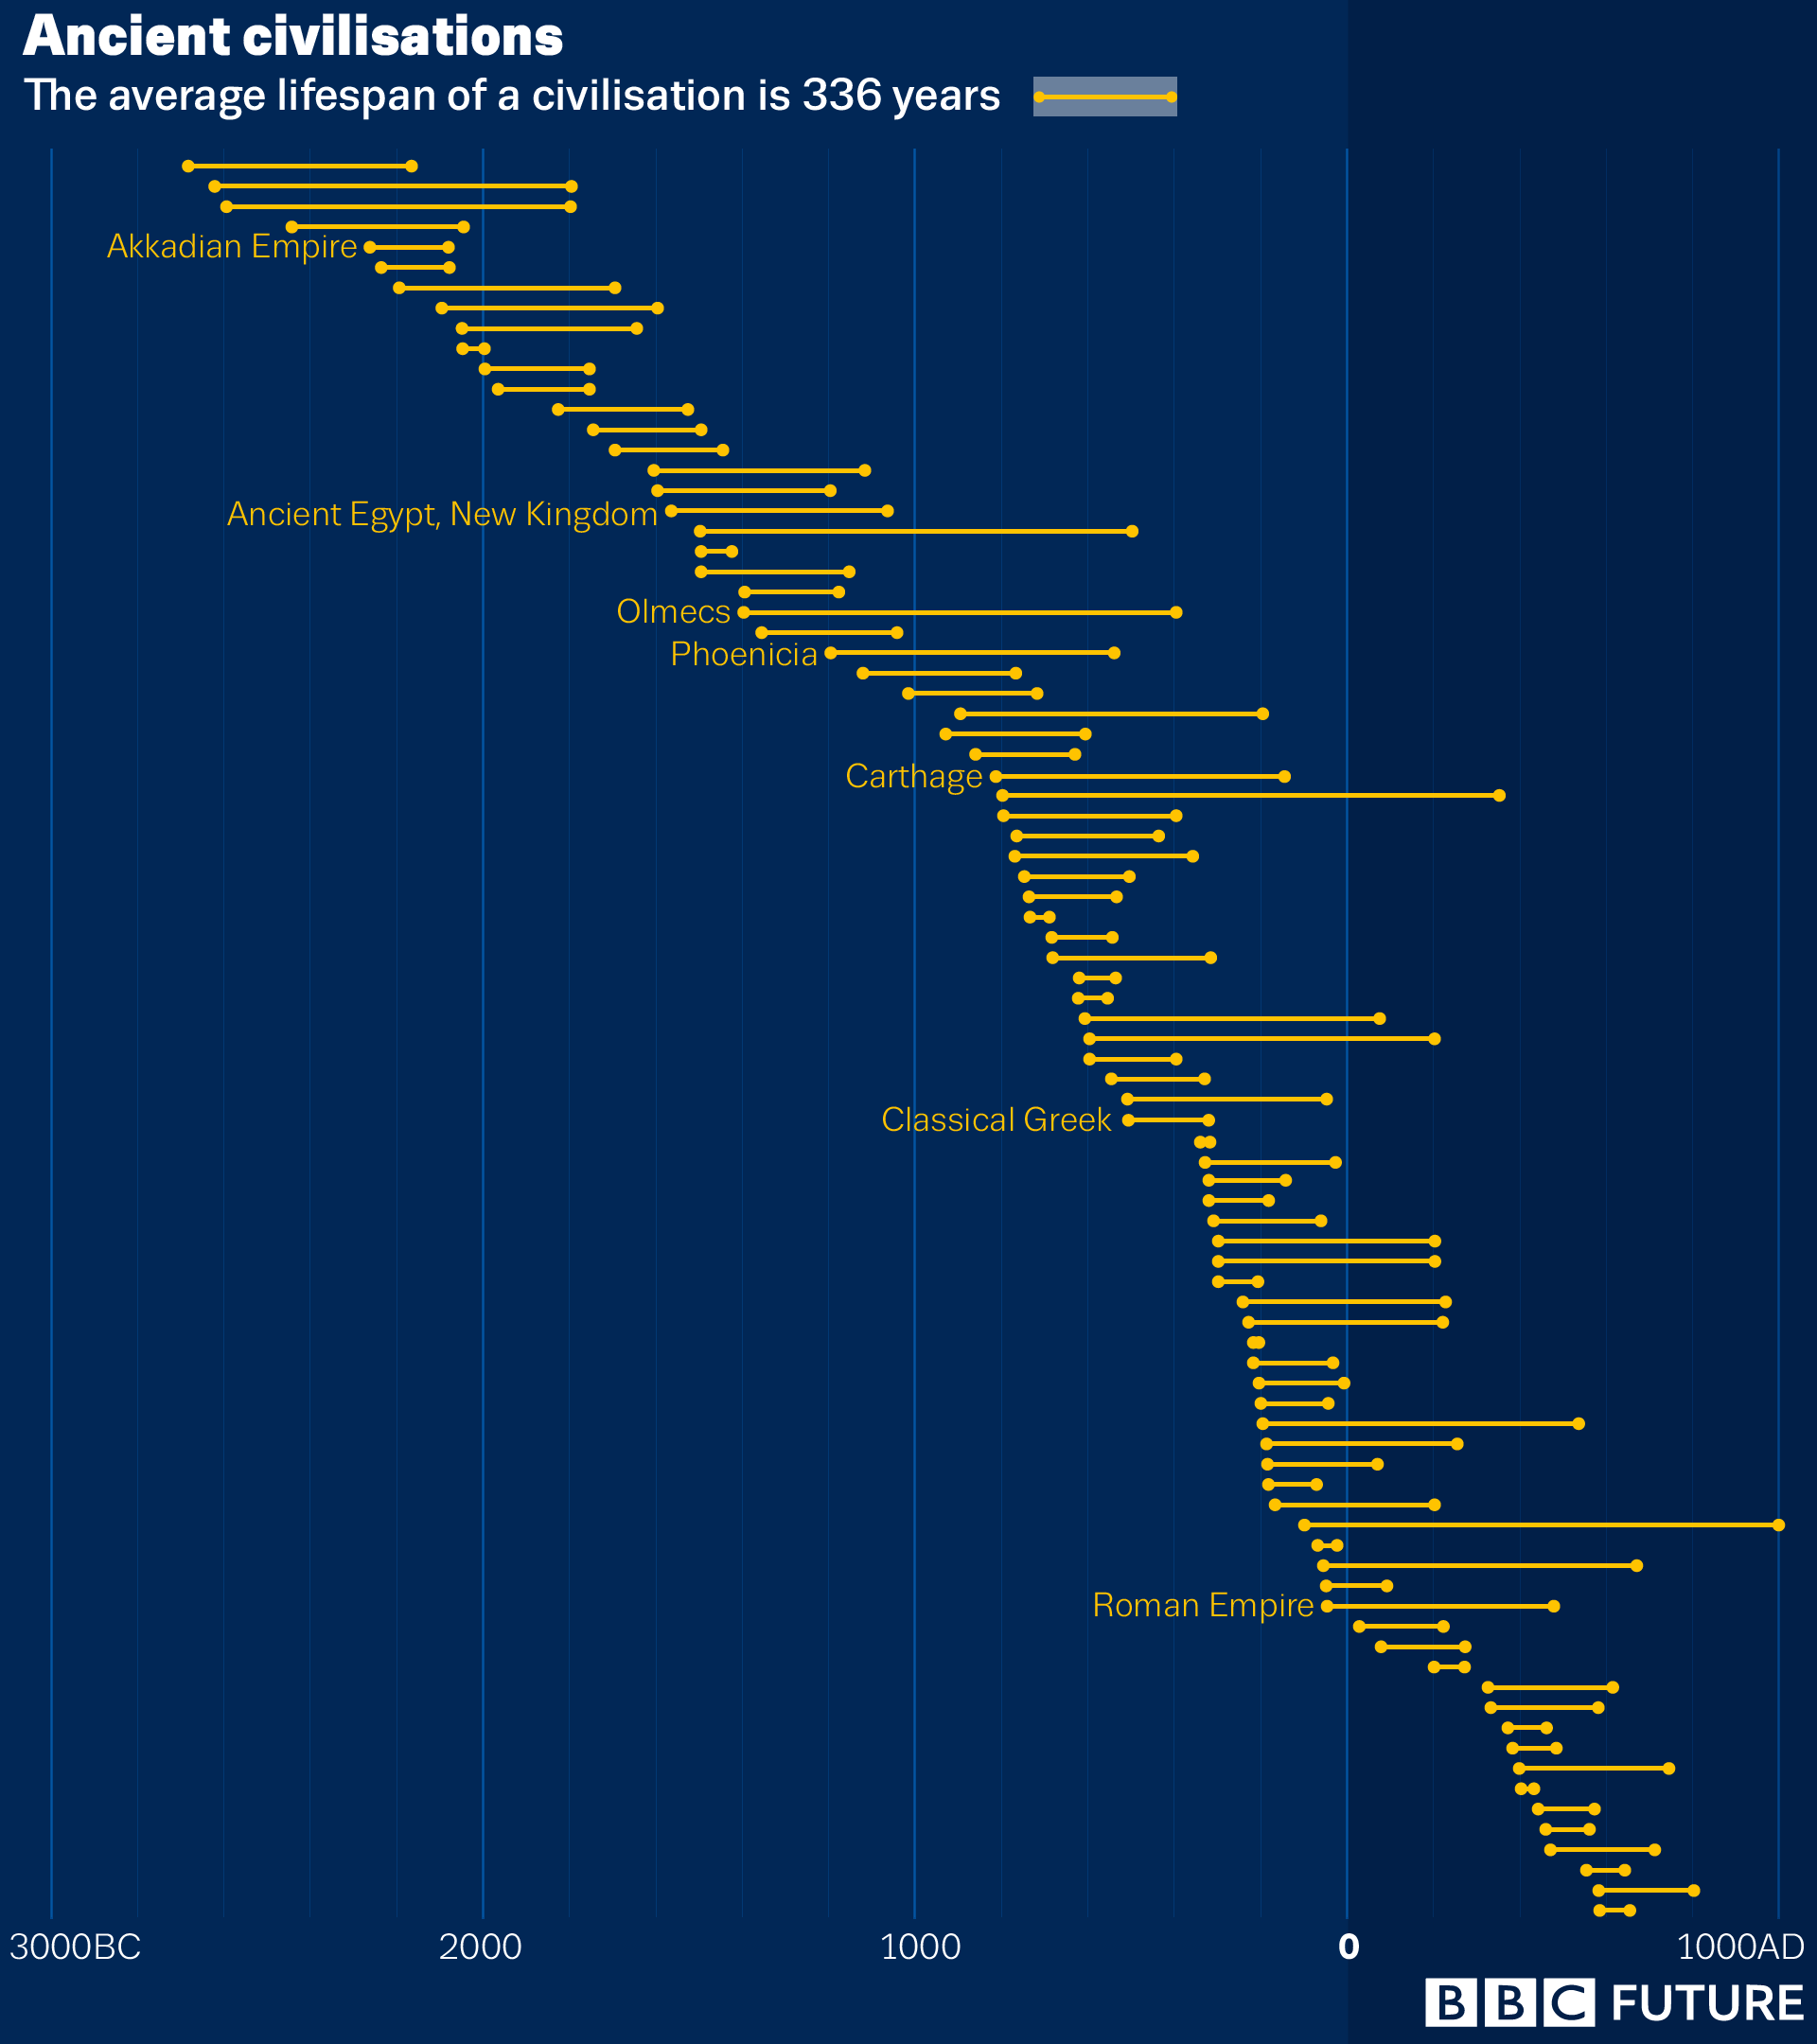 Average lifespan of civilizations